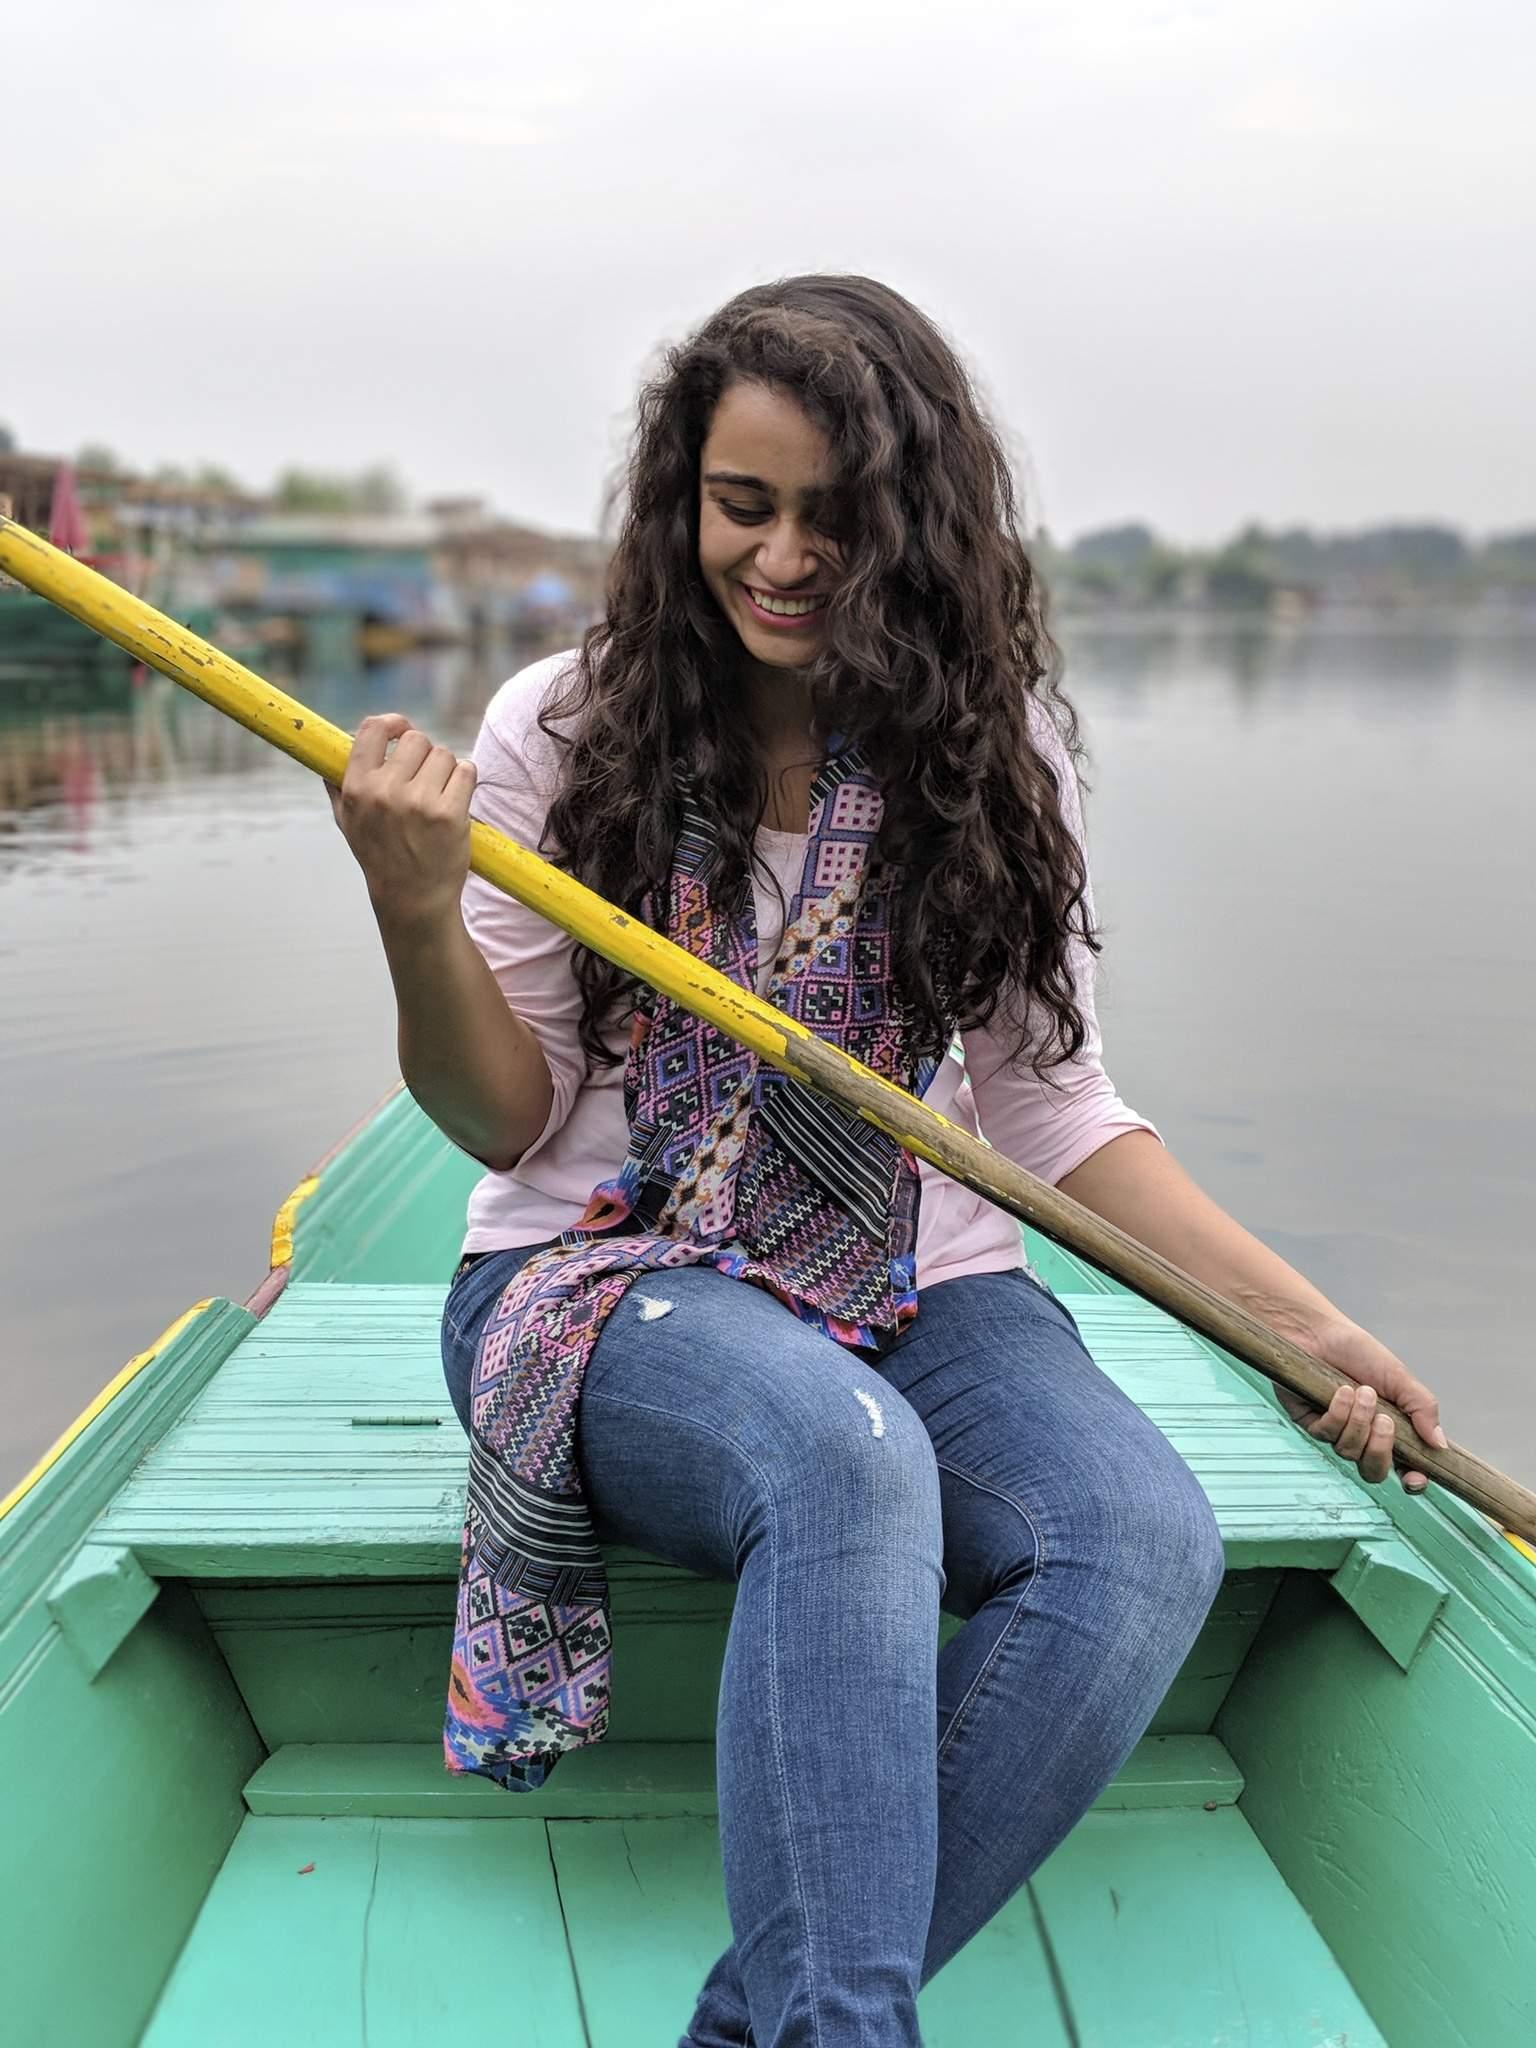 Preethi Parthasarathy